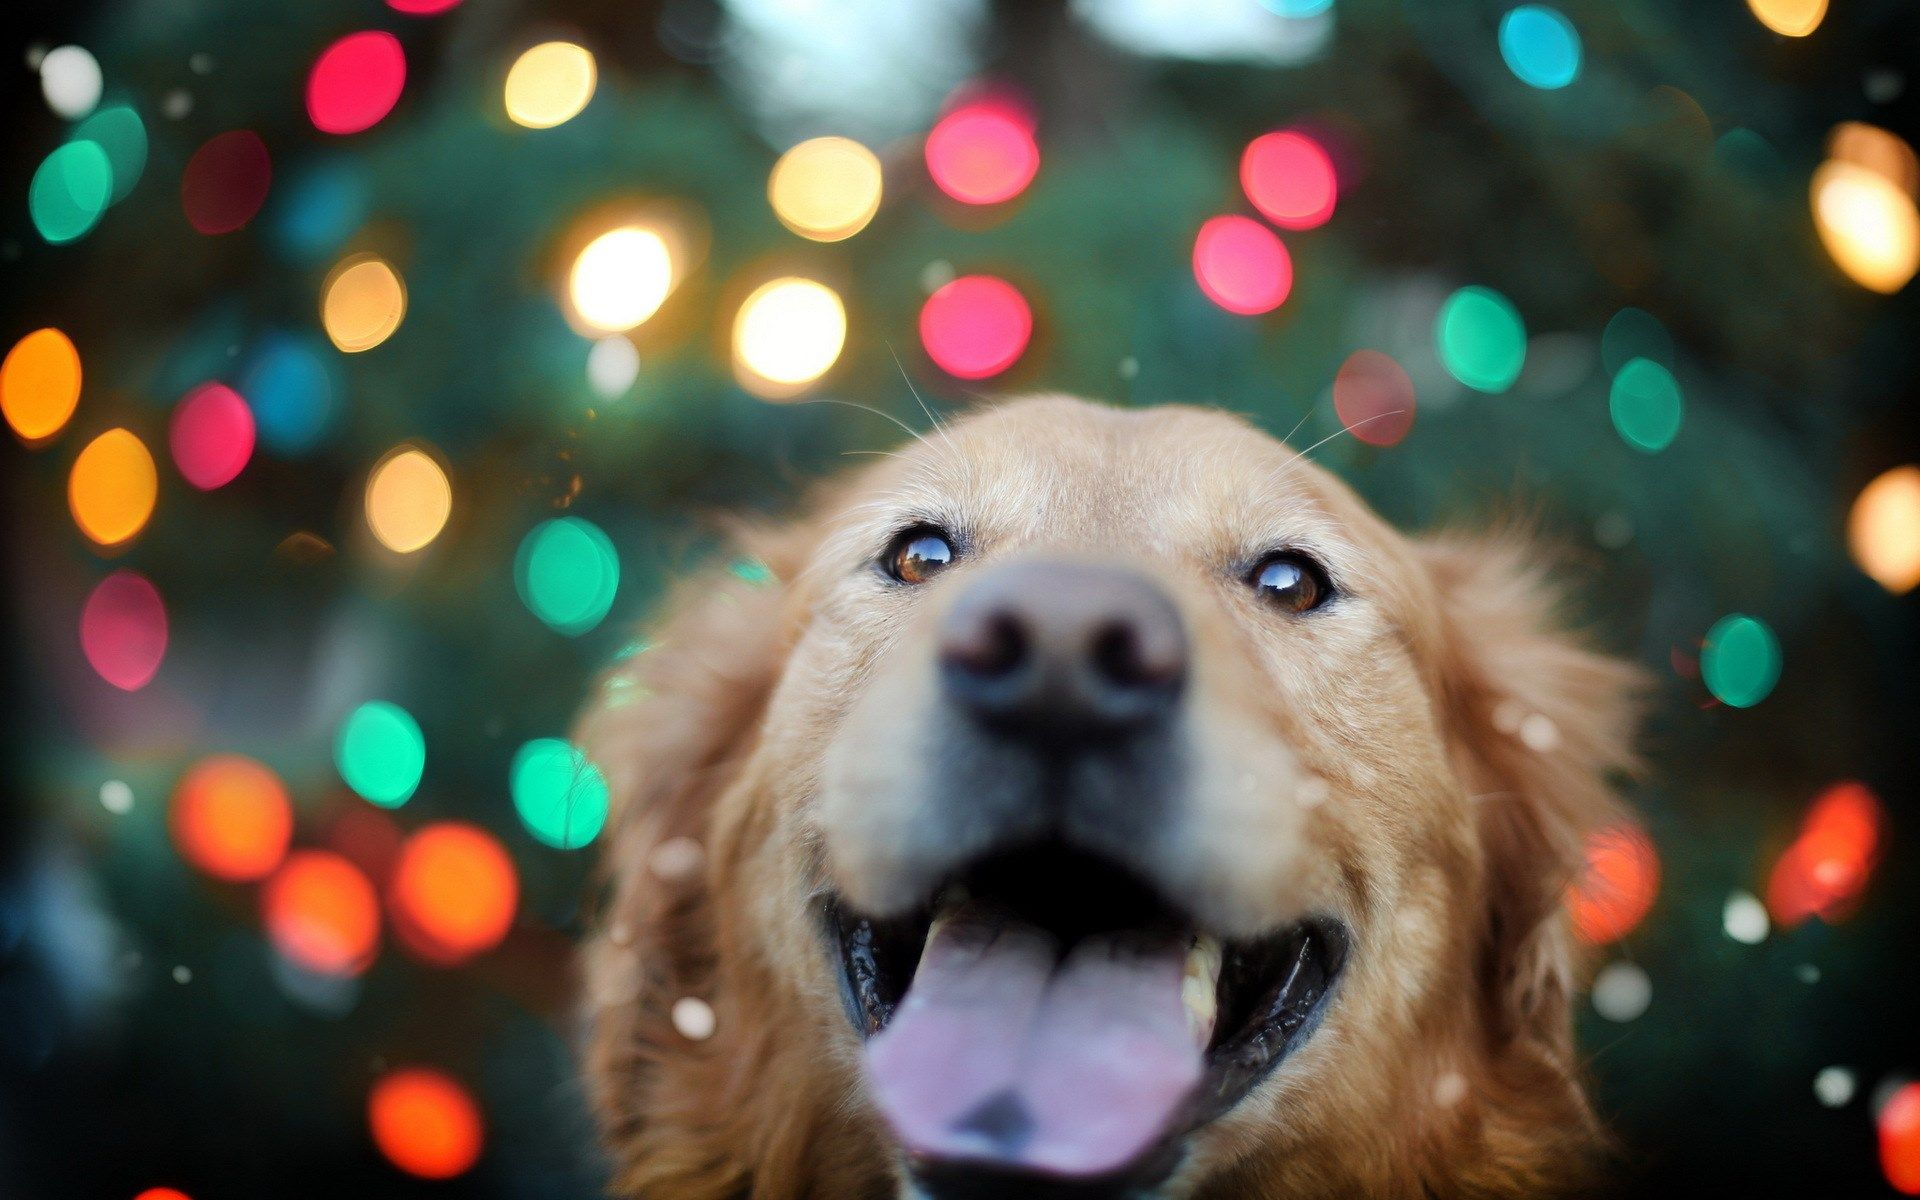 golden retriever loyal dog   Download cool desktop wallpaper and 1920x1200